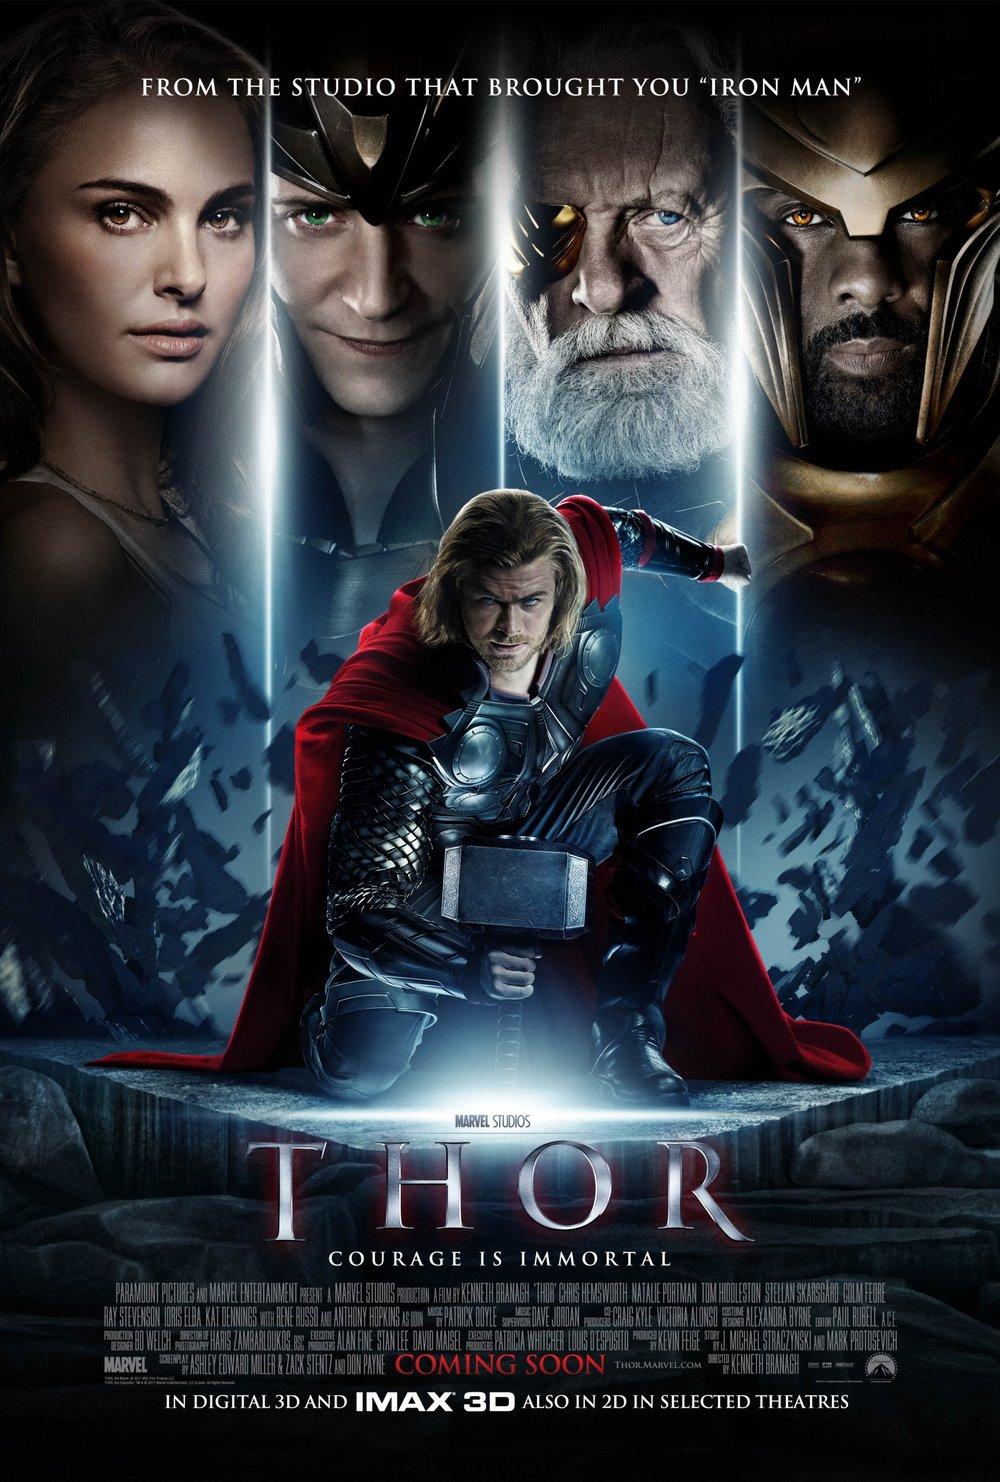 thor-movie-poster-marvel-cinematic-universe-1038890.jpg